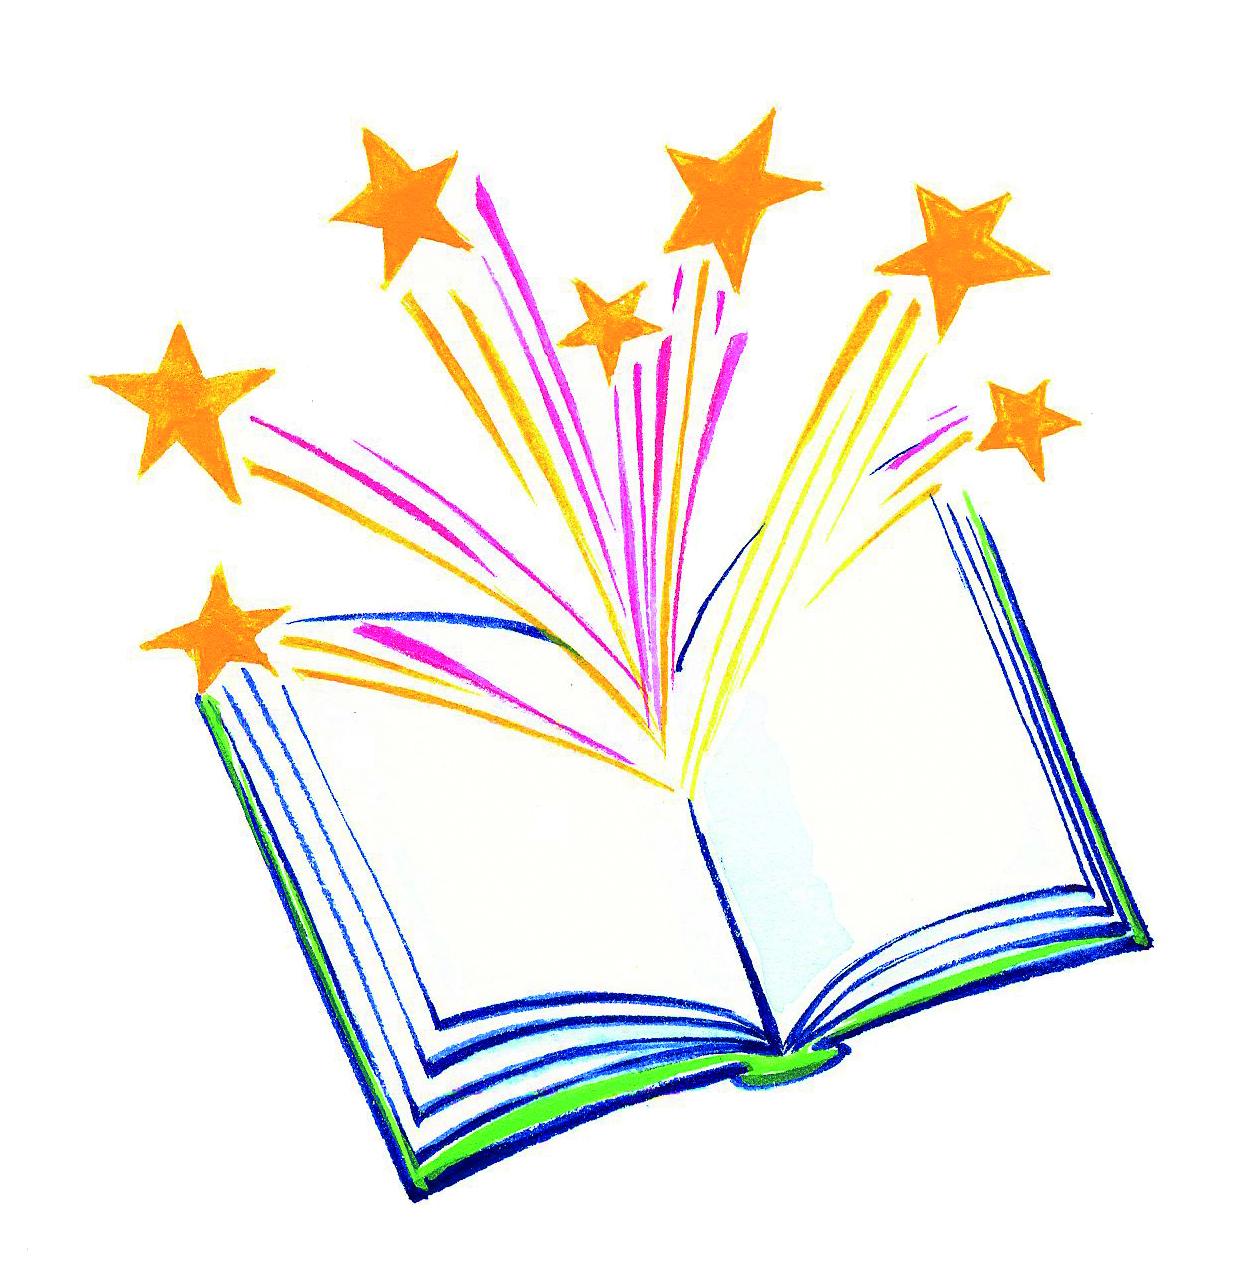 ... de los libros o de deambular rodeado de libros o de conversar con